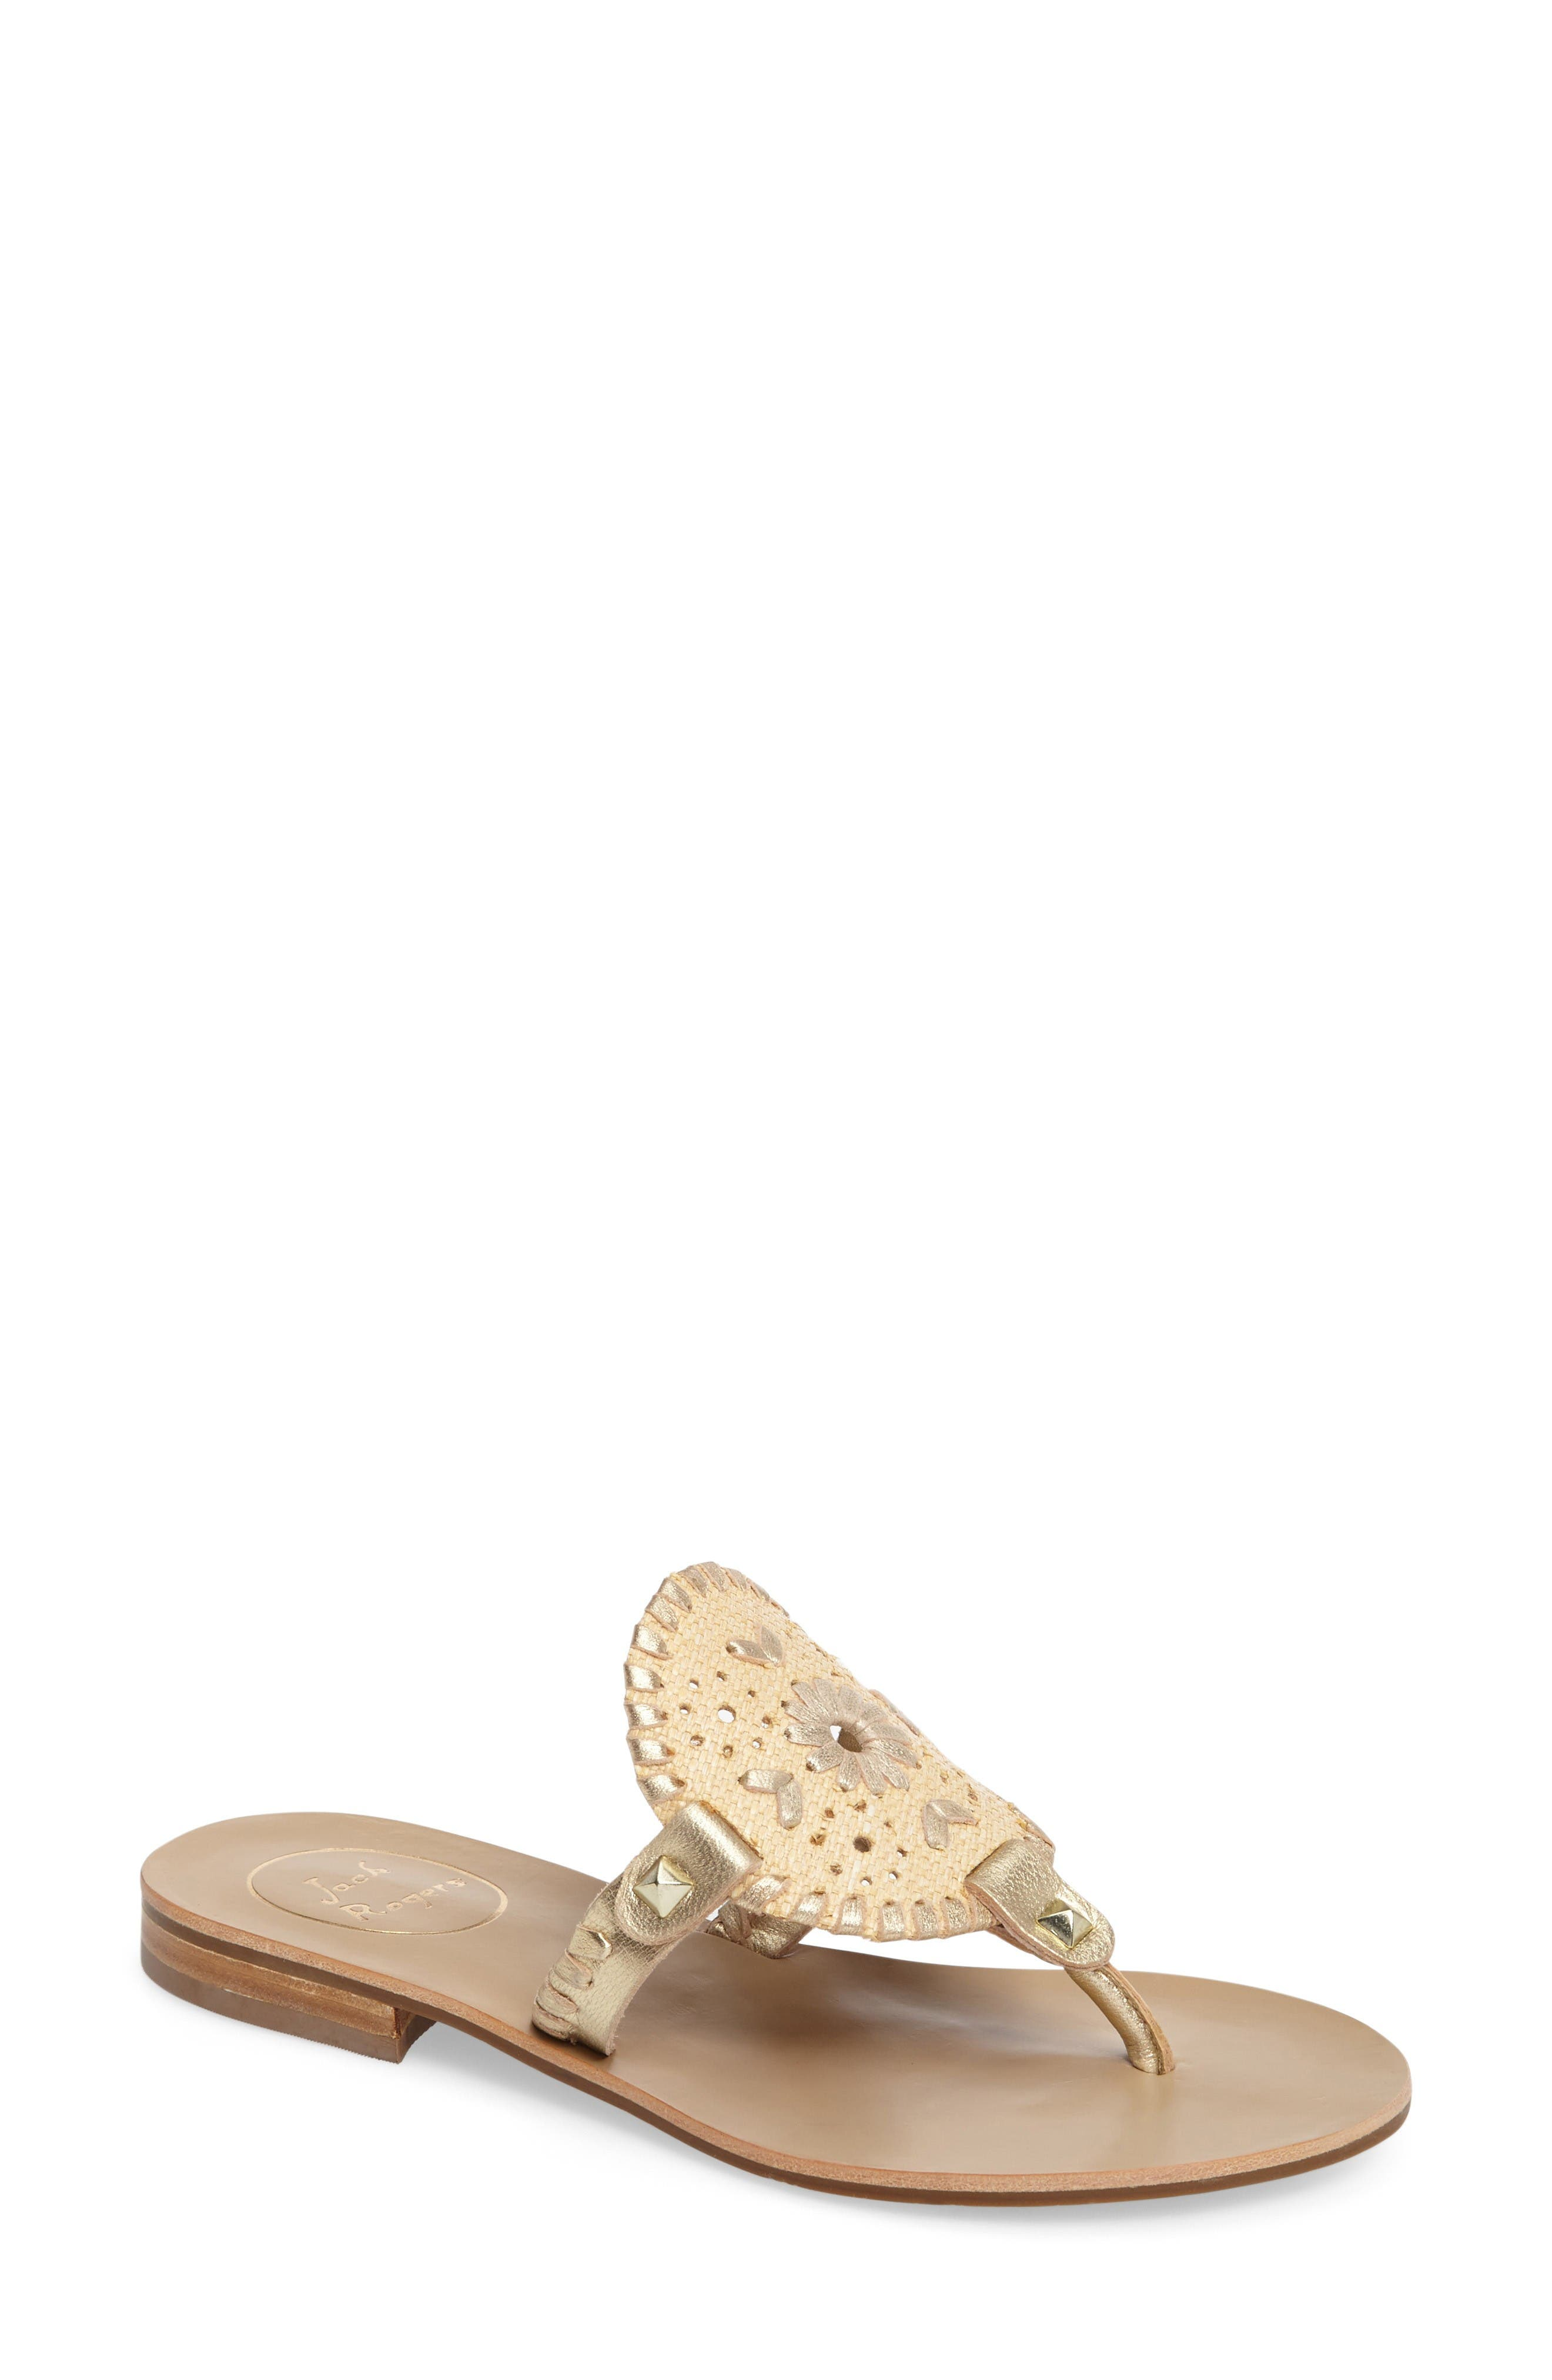 Alternate Image 1 Selected - Jack Rogers 'Georgica' Sandals (Women)